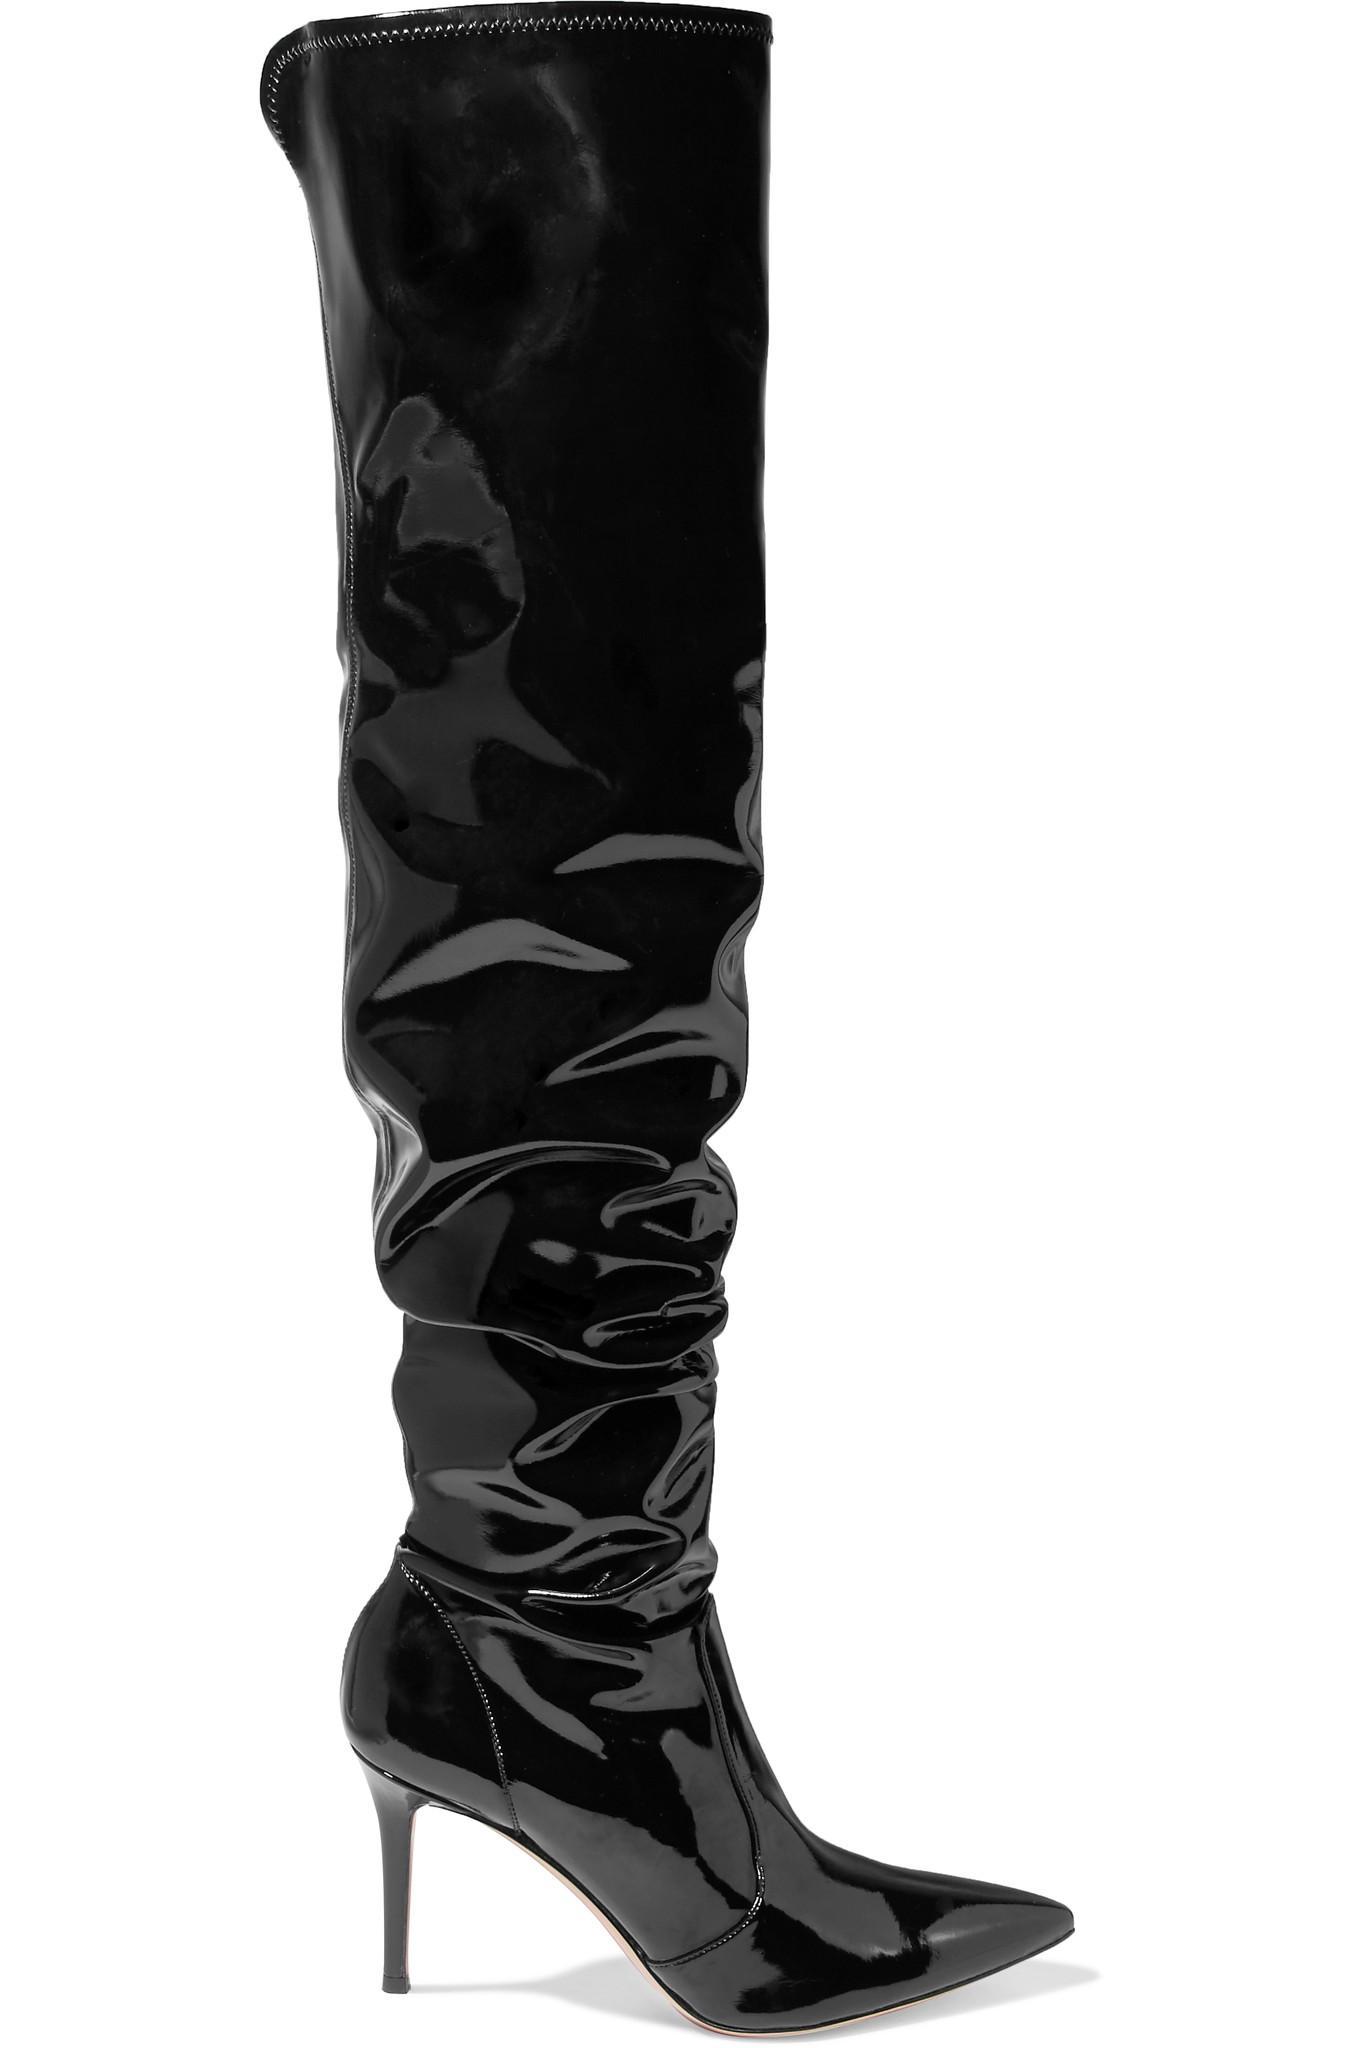 16f14d2786e Lyst - Gianvito Rossi 85 Vinyl Over-the-knee Boots in Black